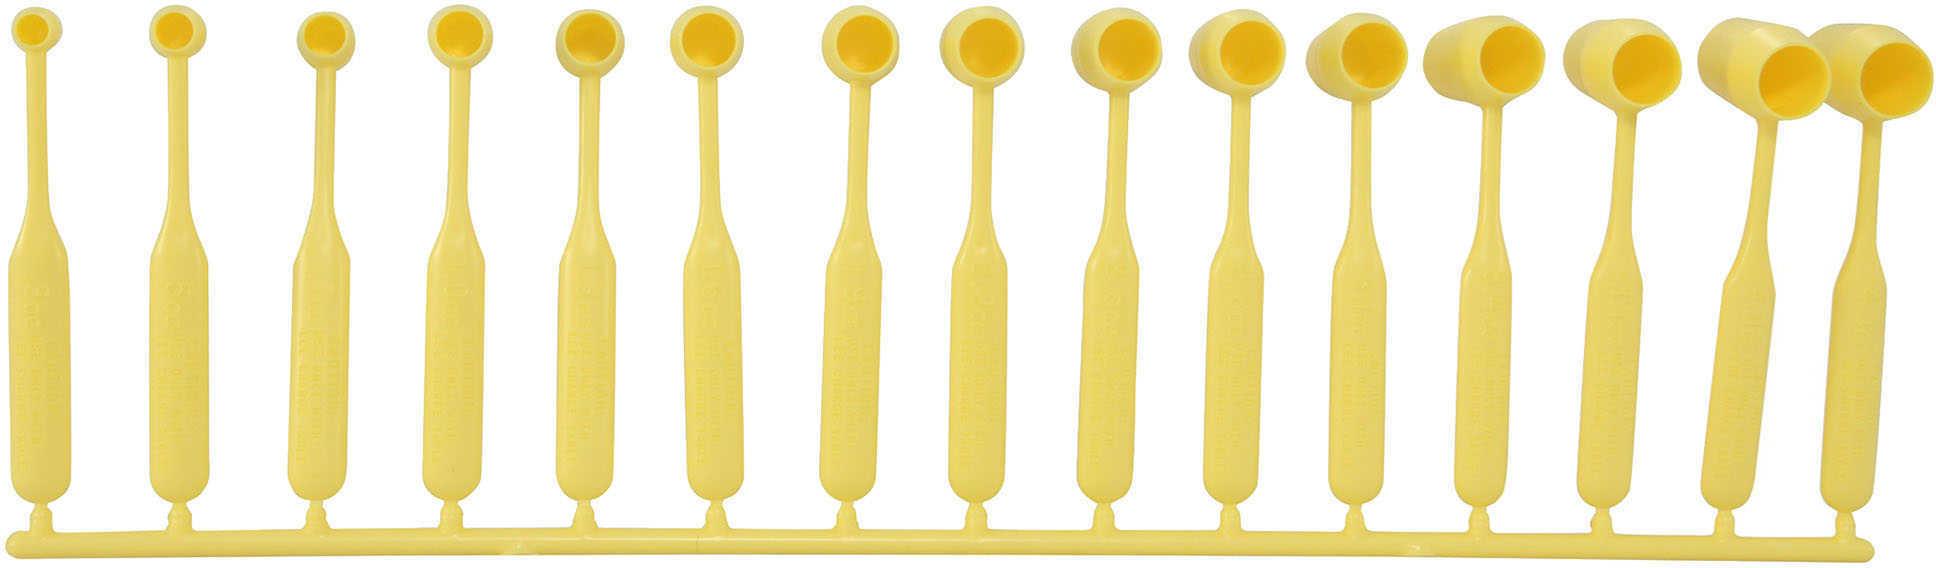 Lee 90100 Powder Measure Kit Fifteen Powder Measures All Universal